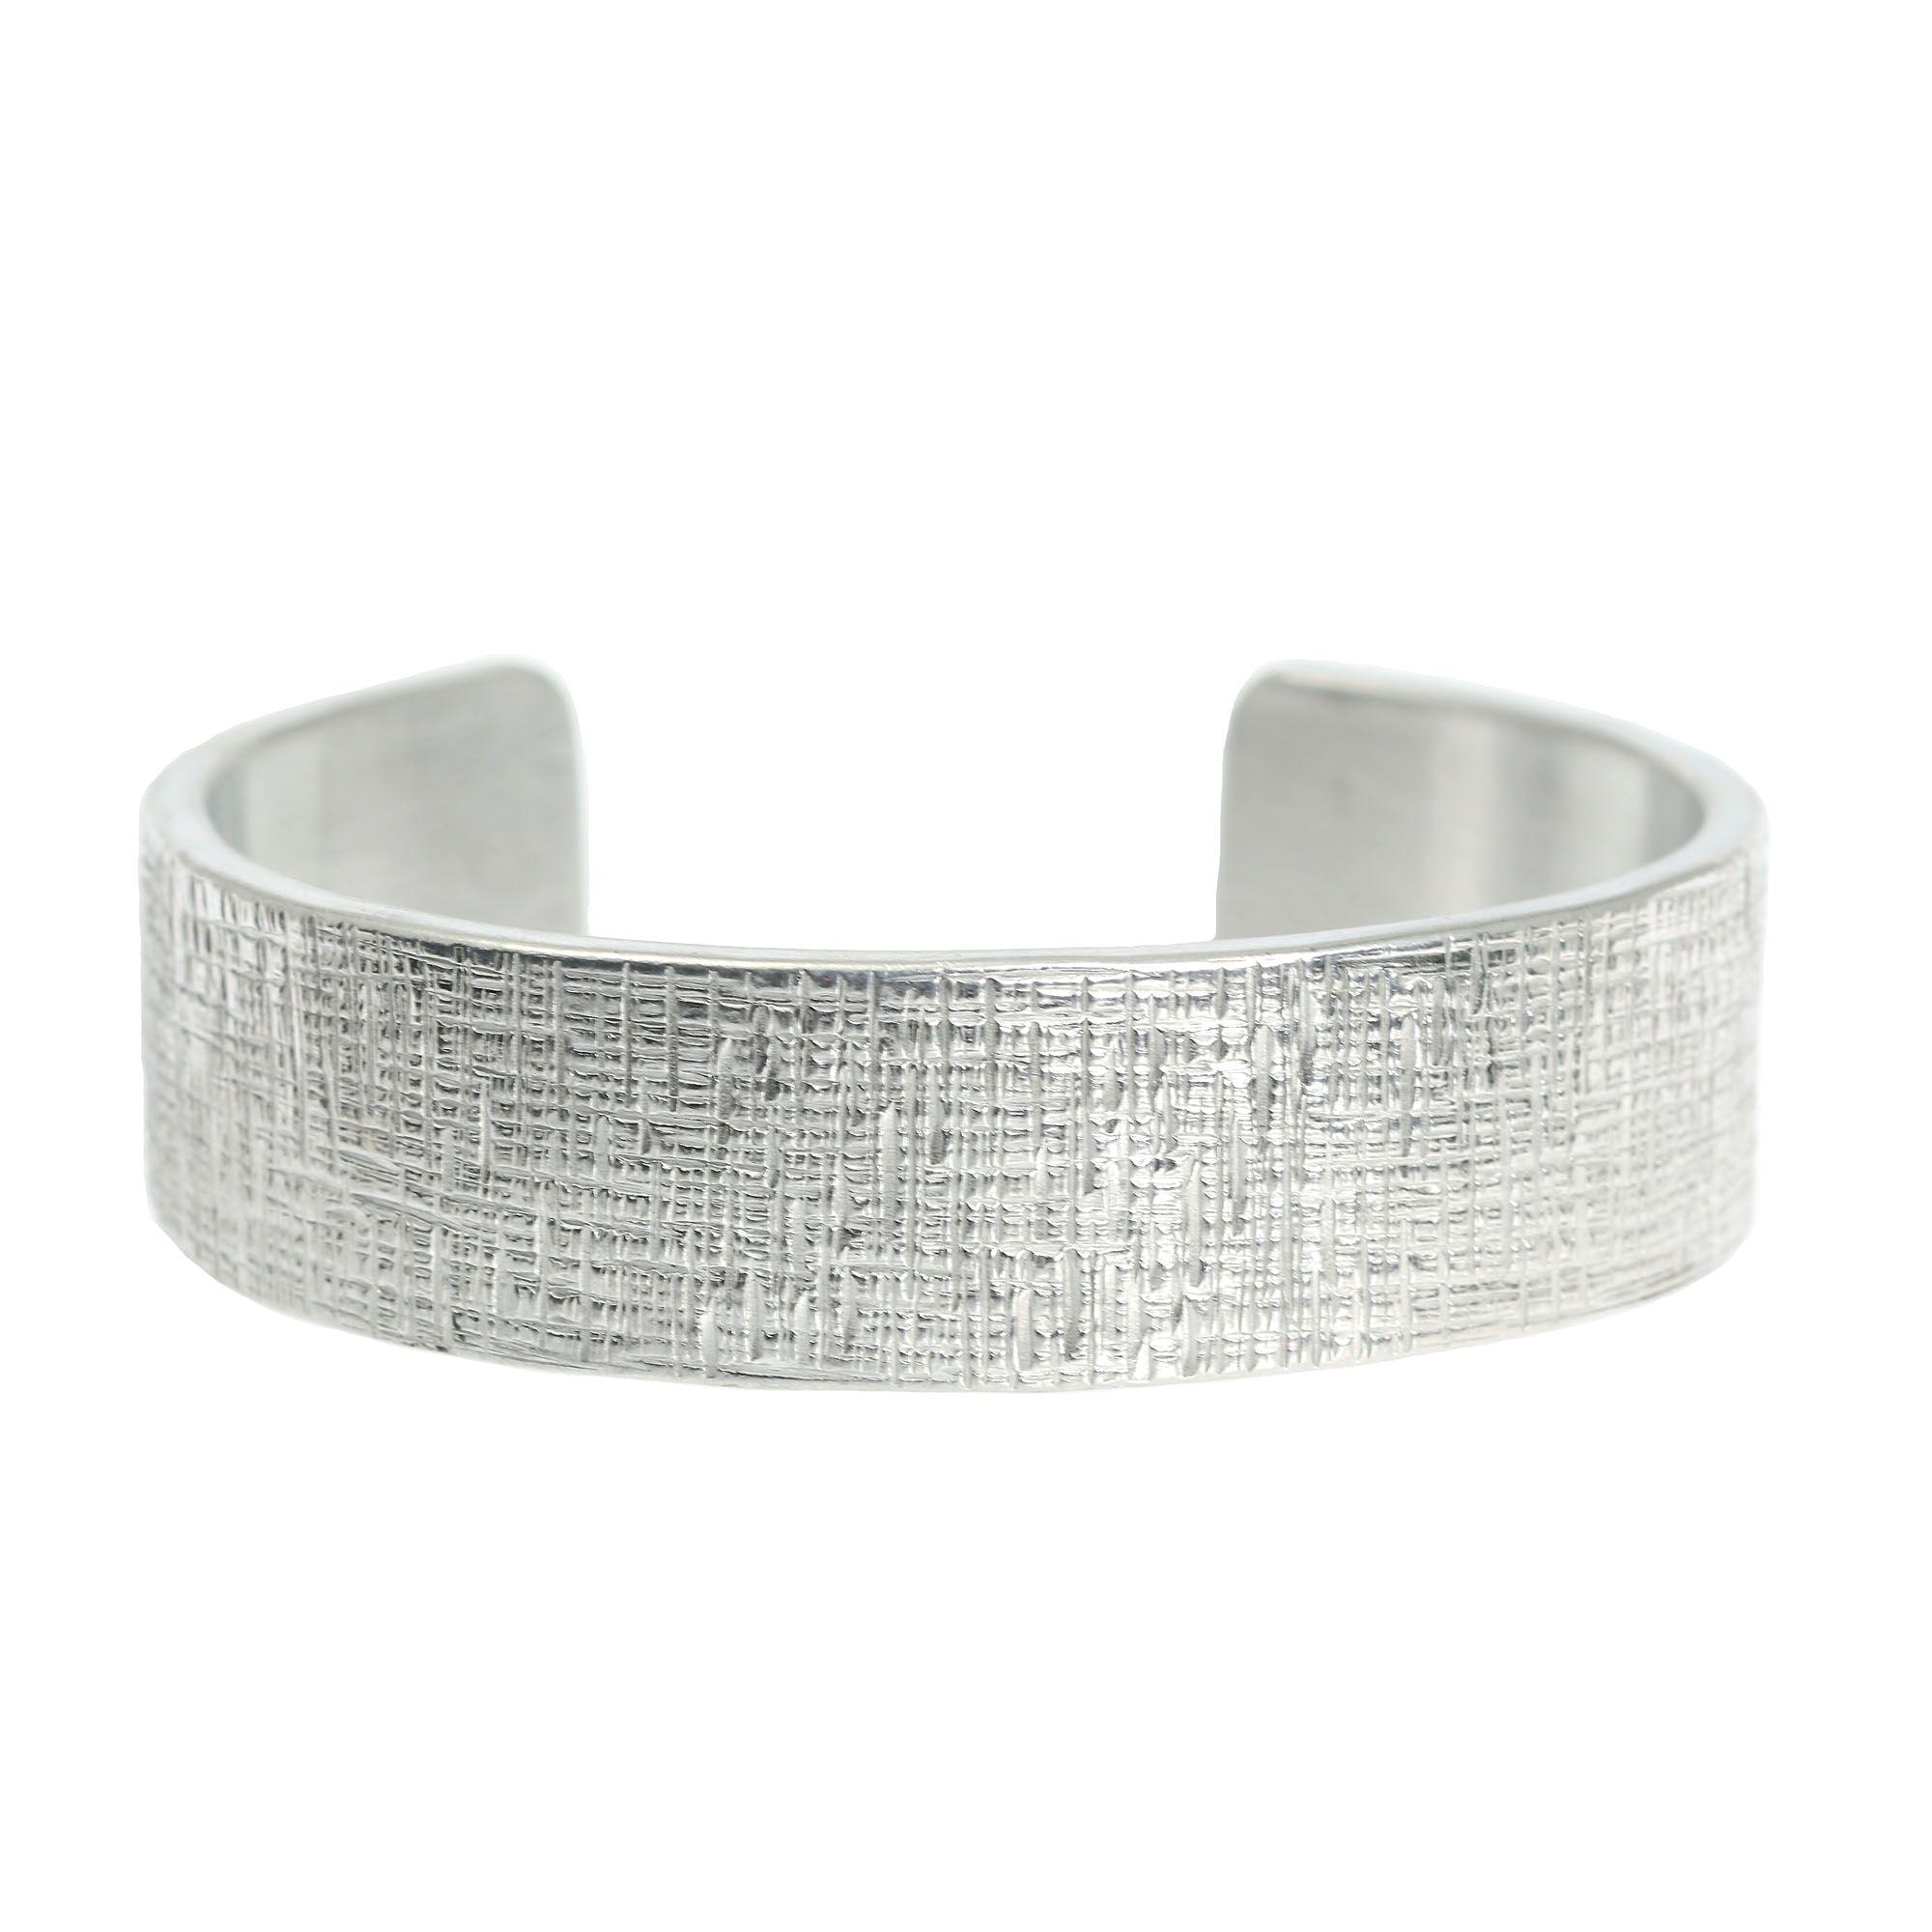 Over off elegant mm wide linen silver tone cuff bracelet shown